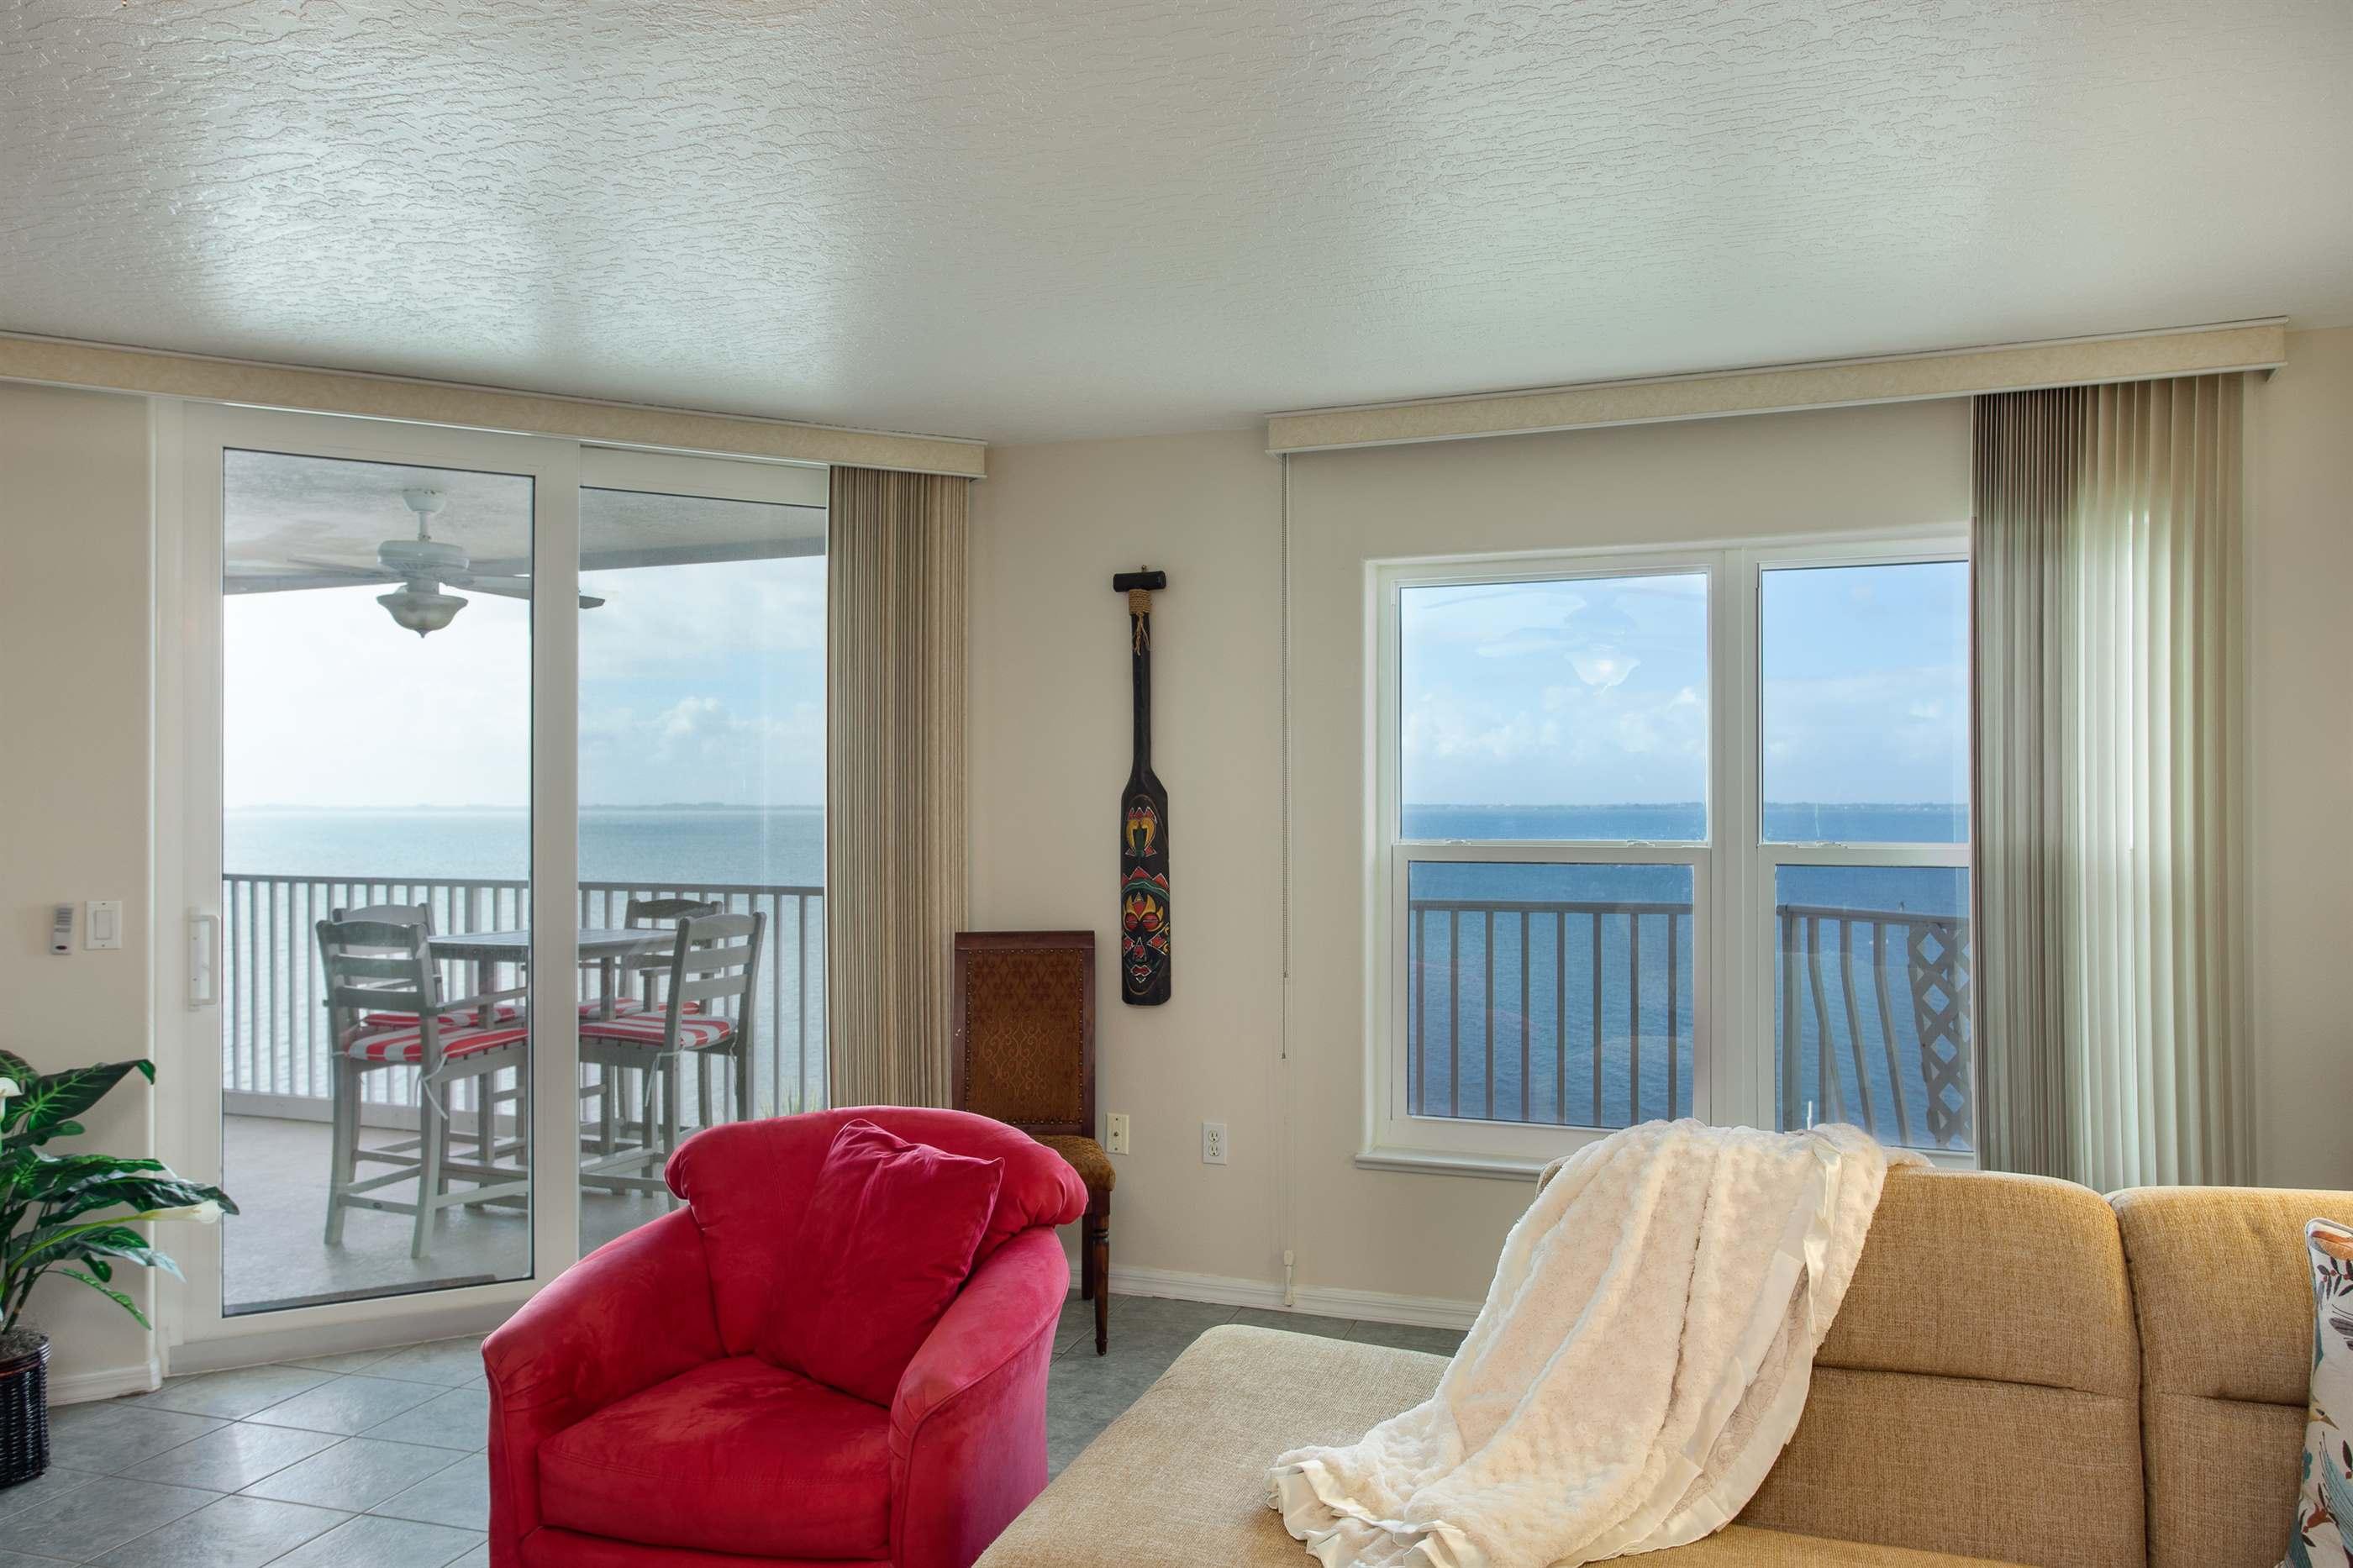 3360 S Atlantic Ave, #406, Cocoa Beach, FL 32931